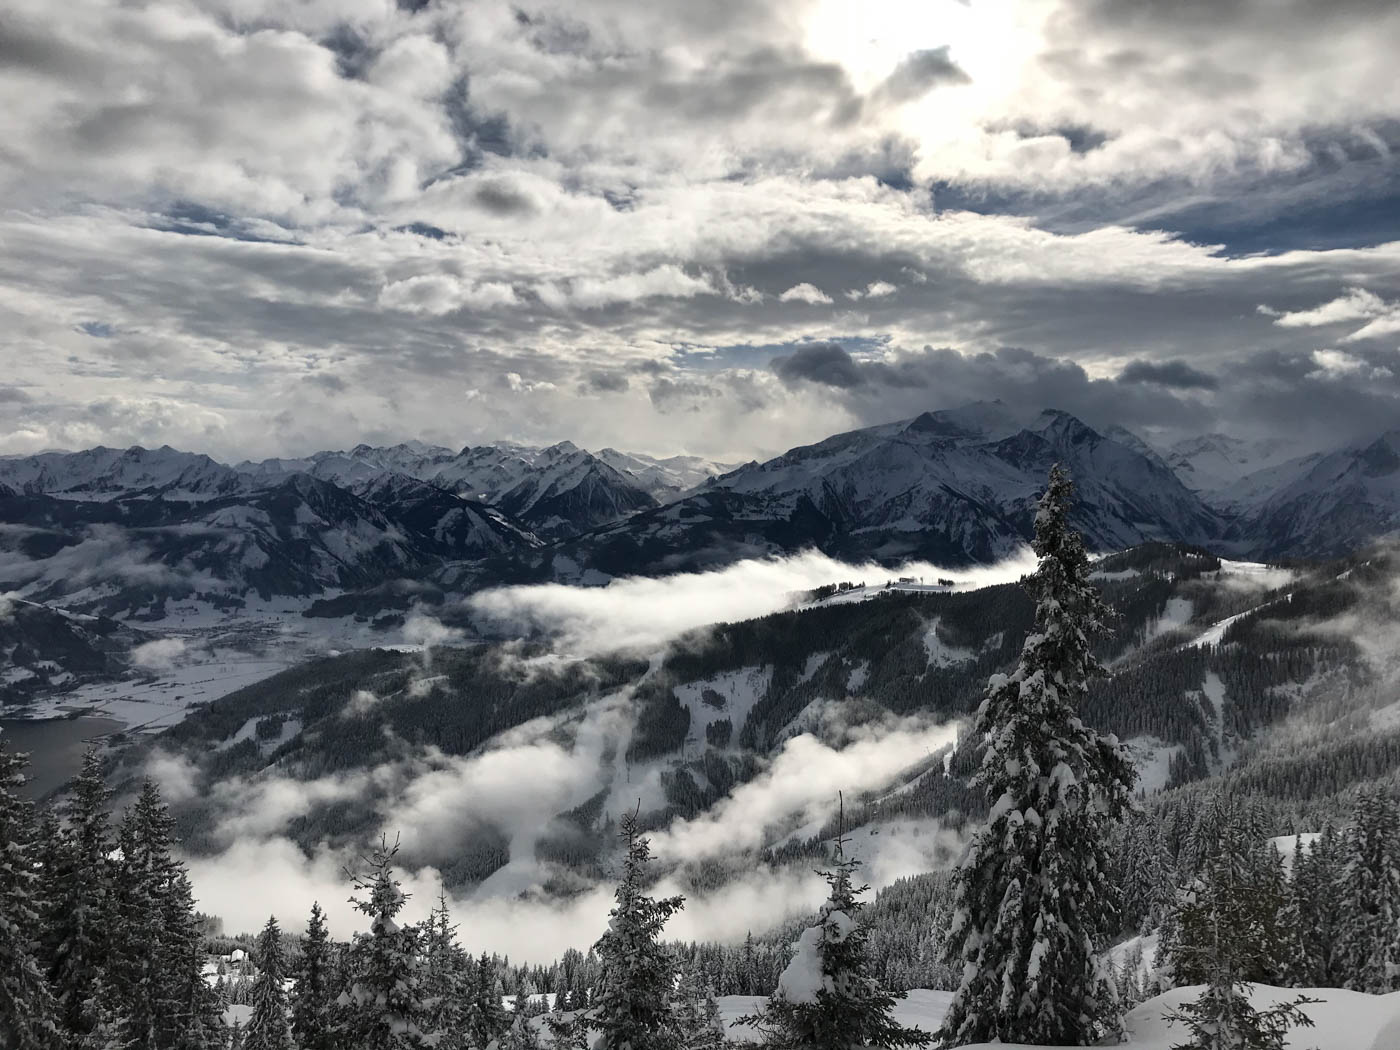 Nach dem Schneesturm: Blick zur Schmittenhöhe, Österreich, Alpen, Zell am See